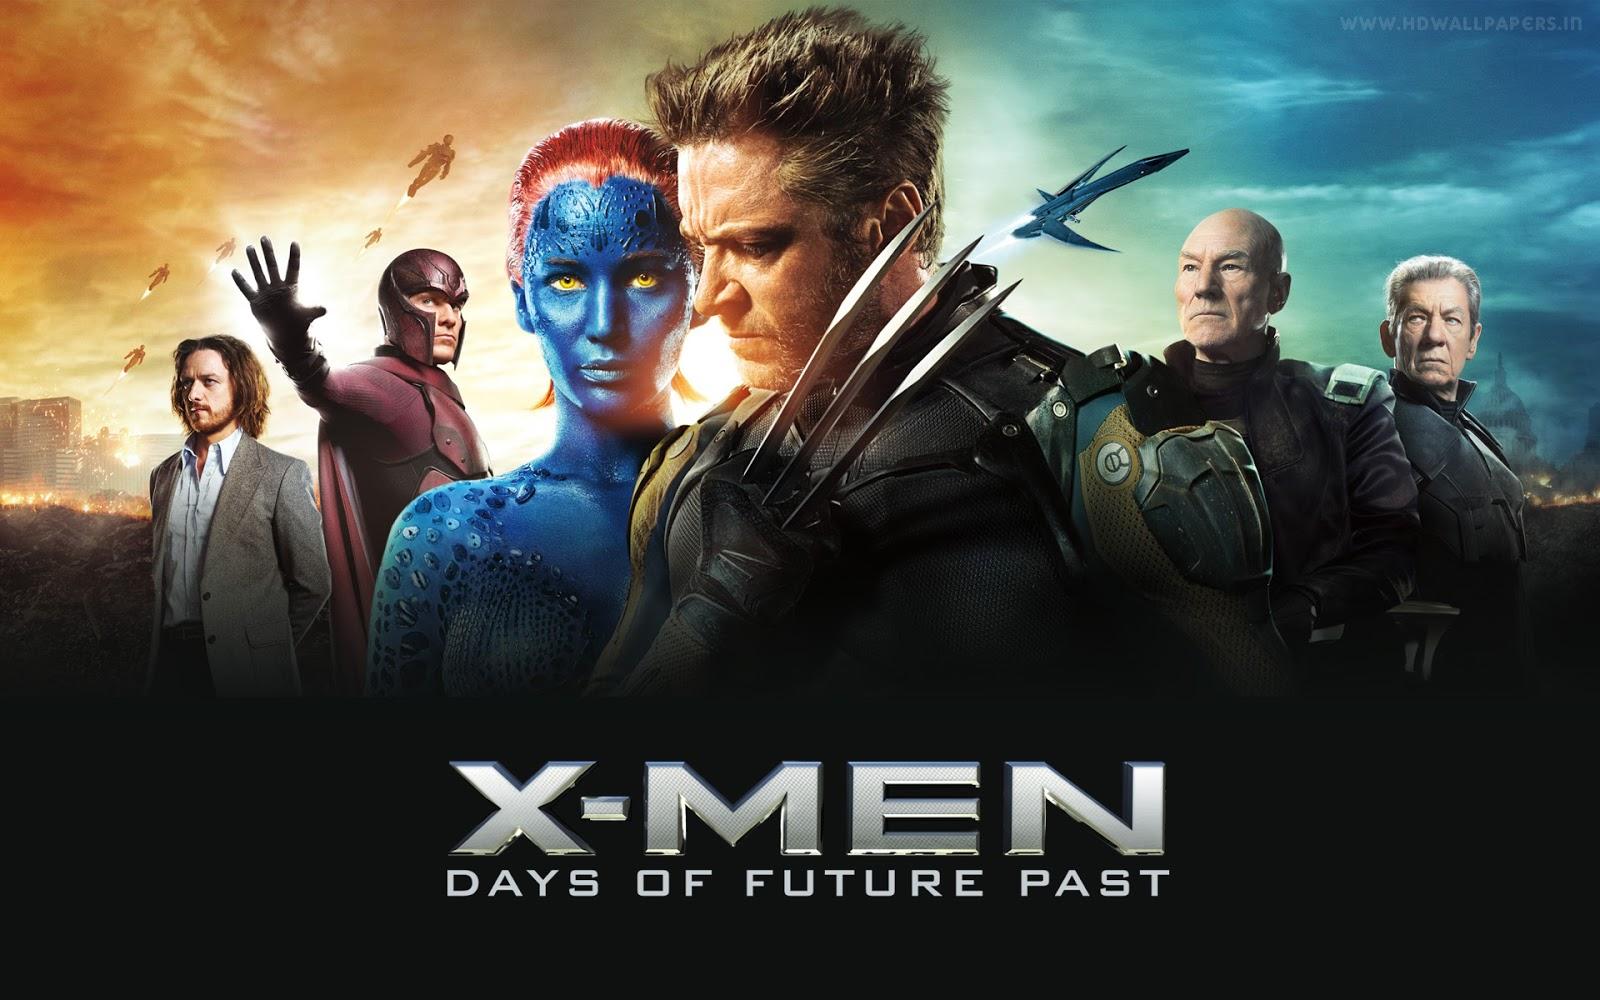 X-Men DOFP Hugh Jackman Jennifer Lawrence Michael Fassbender James McAvoy Patrick Stewart Ian McKellen